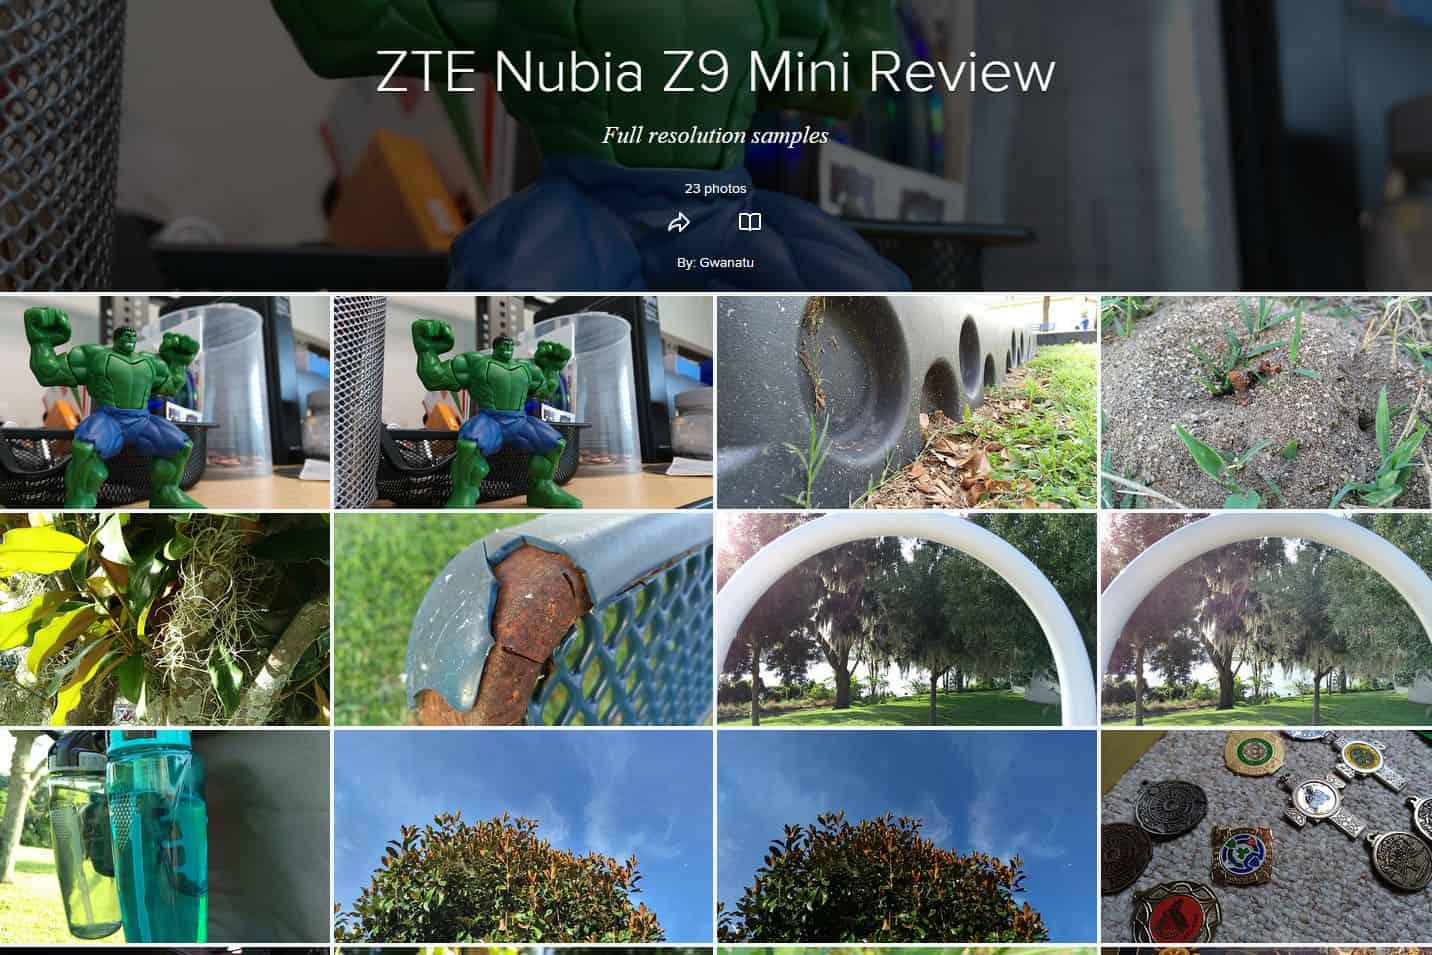 zte-nubia-z9-mini-review-flickr-AH